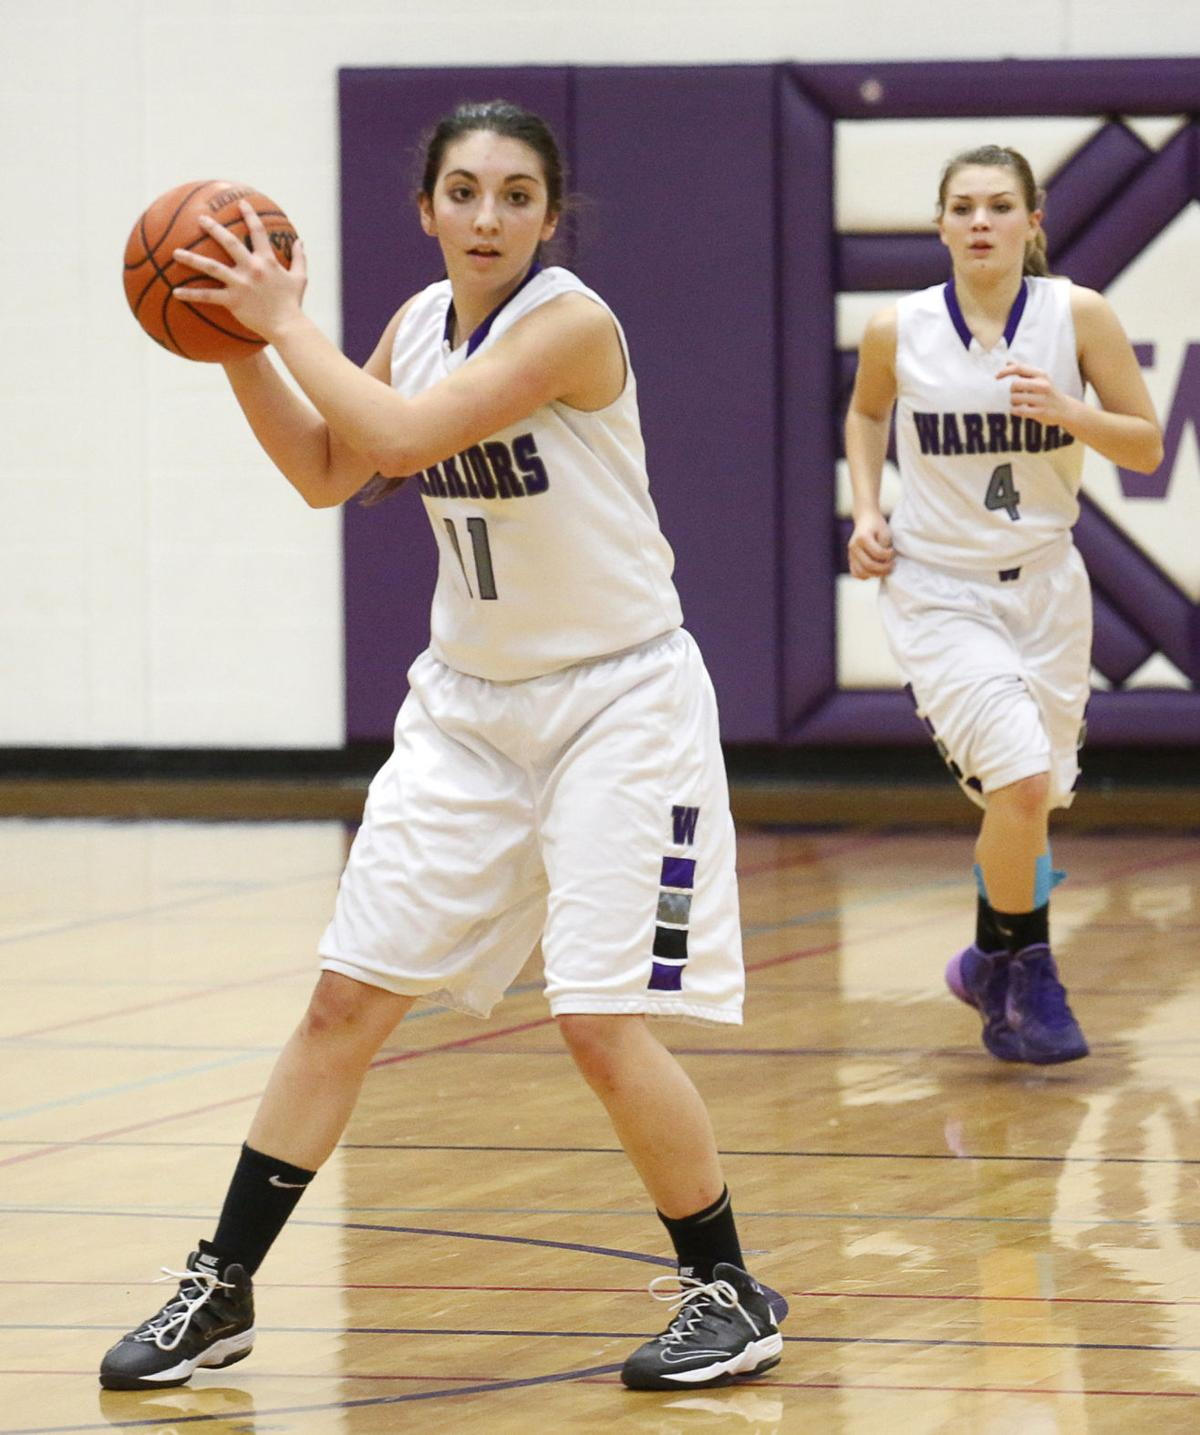 Girls basketball Hoepfl era begins at Warrenton